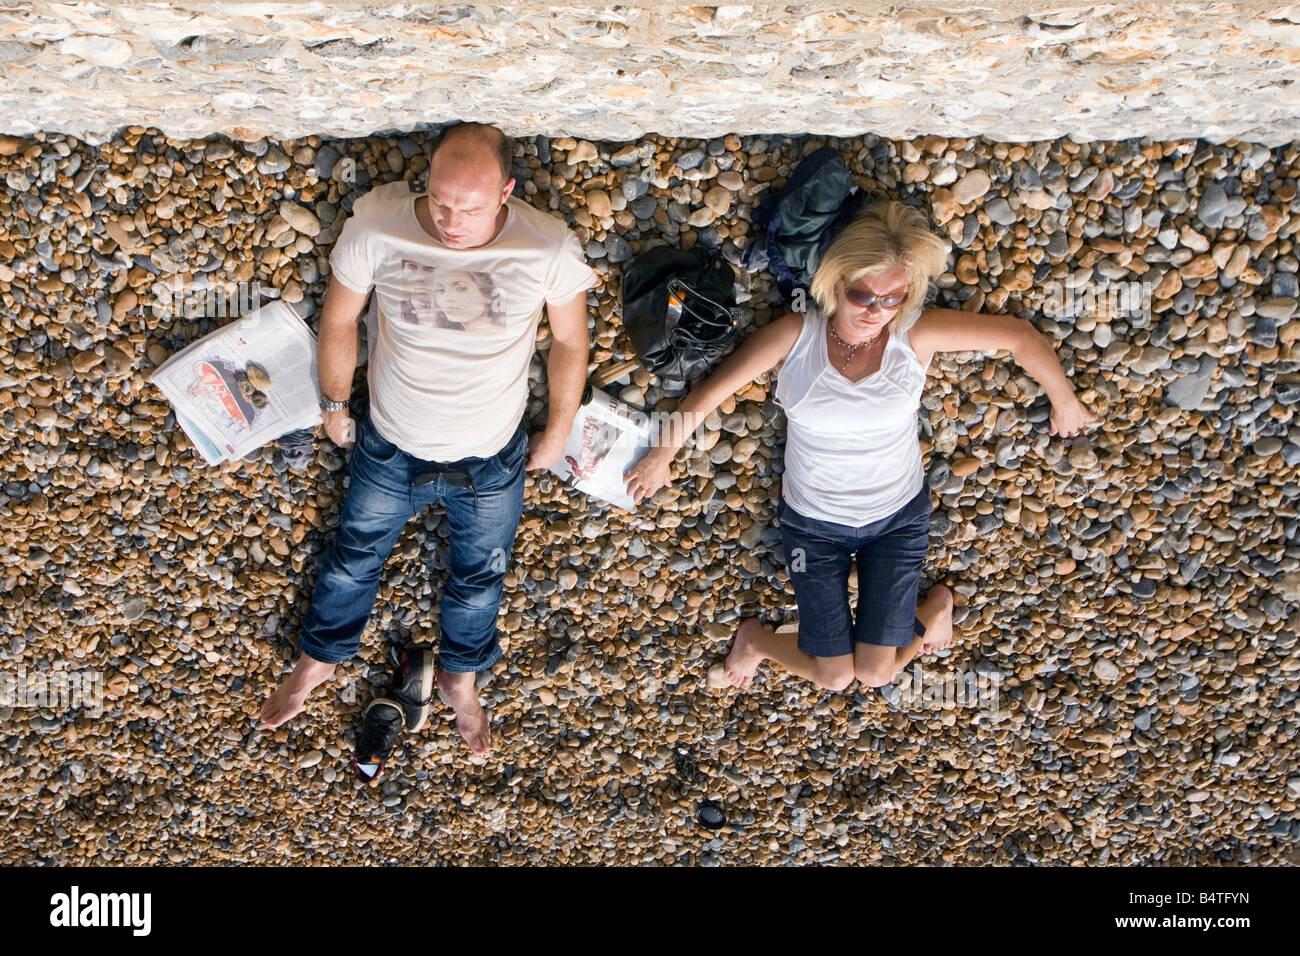 sunbathers on brighton beach, england - Stock Image